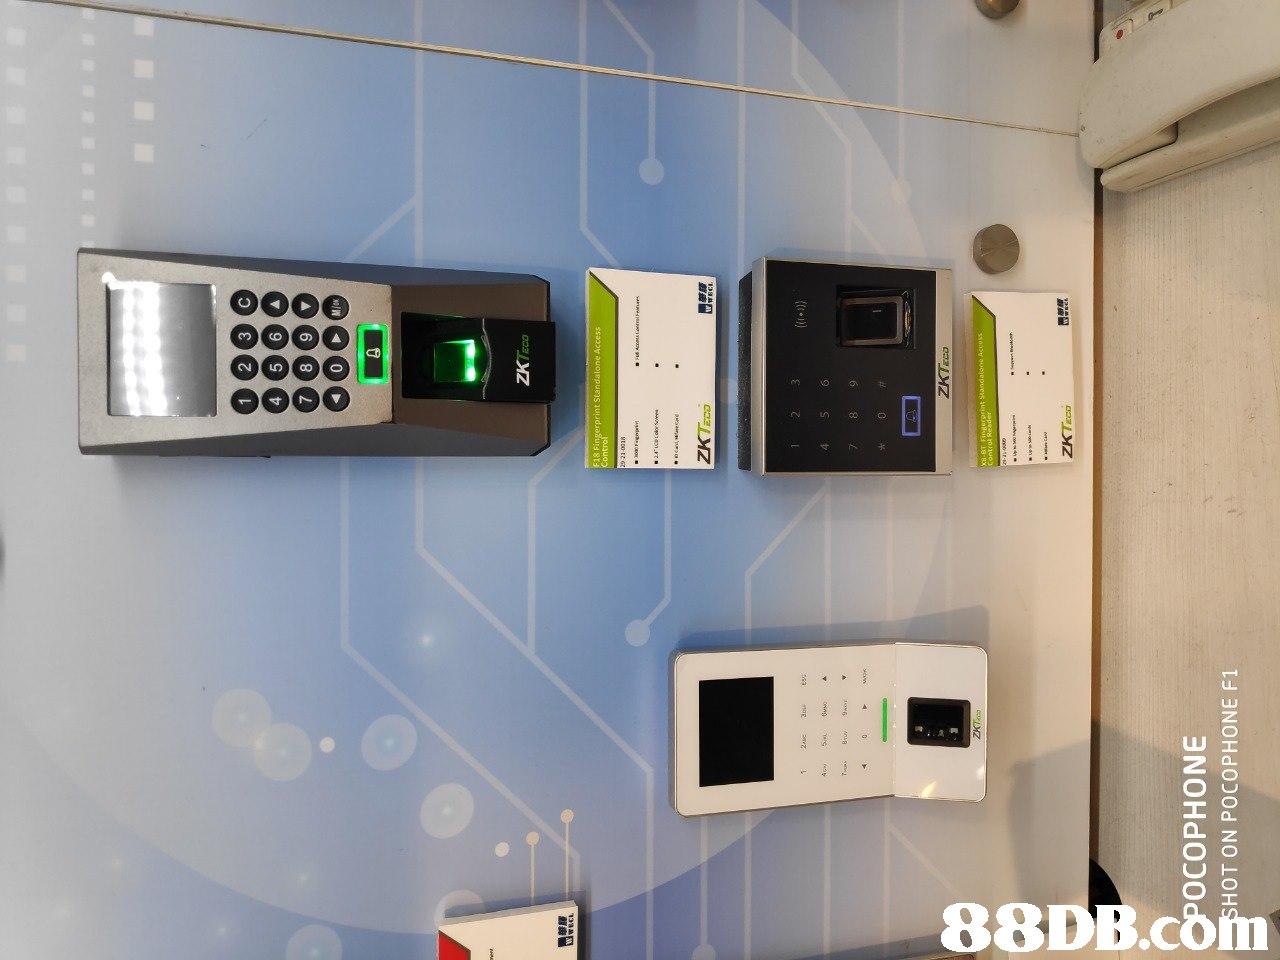 4 5 6 7 8 9 OPOCOPHONE HOT ON POCOPHONE F1,Machine,Technology,Home automation,Room,Electronics